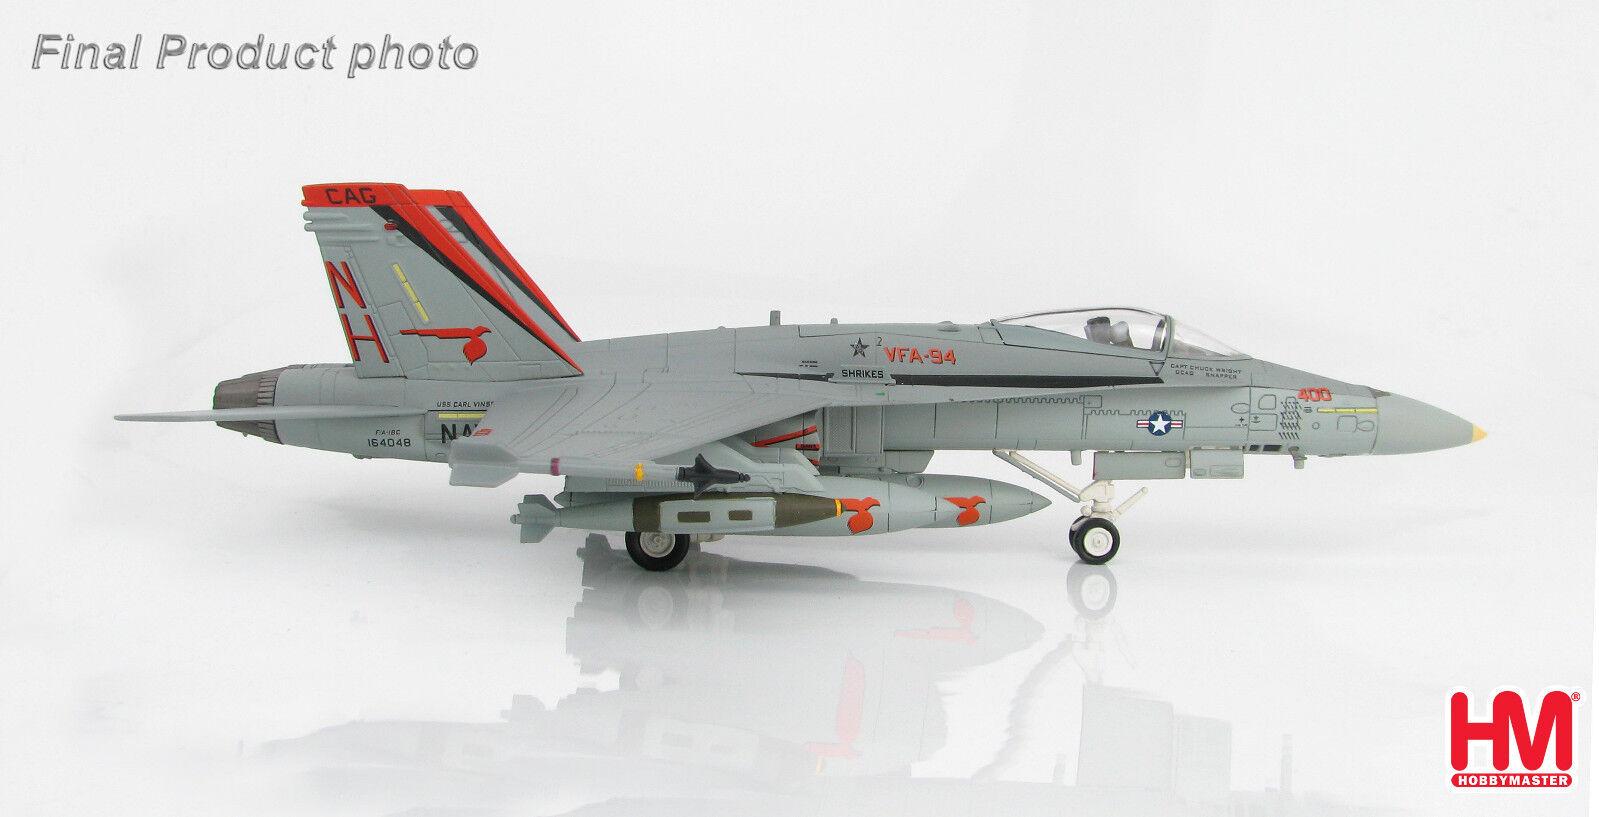 Hobby - meister ha3529, f   a-18c hornet, buno 164048 von vfa-94, us - marine 1 72